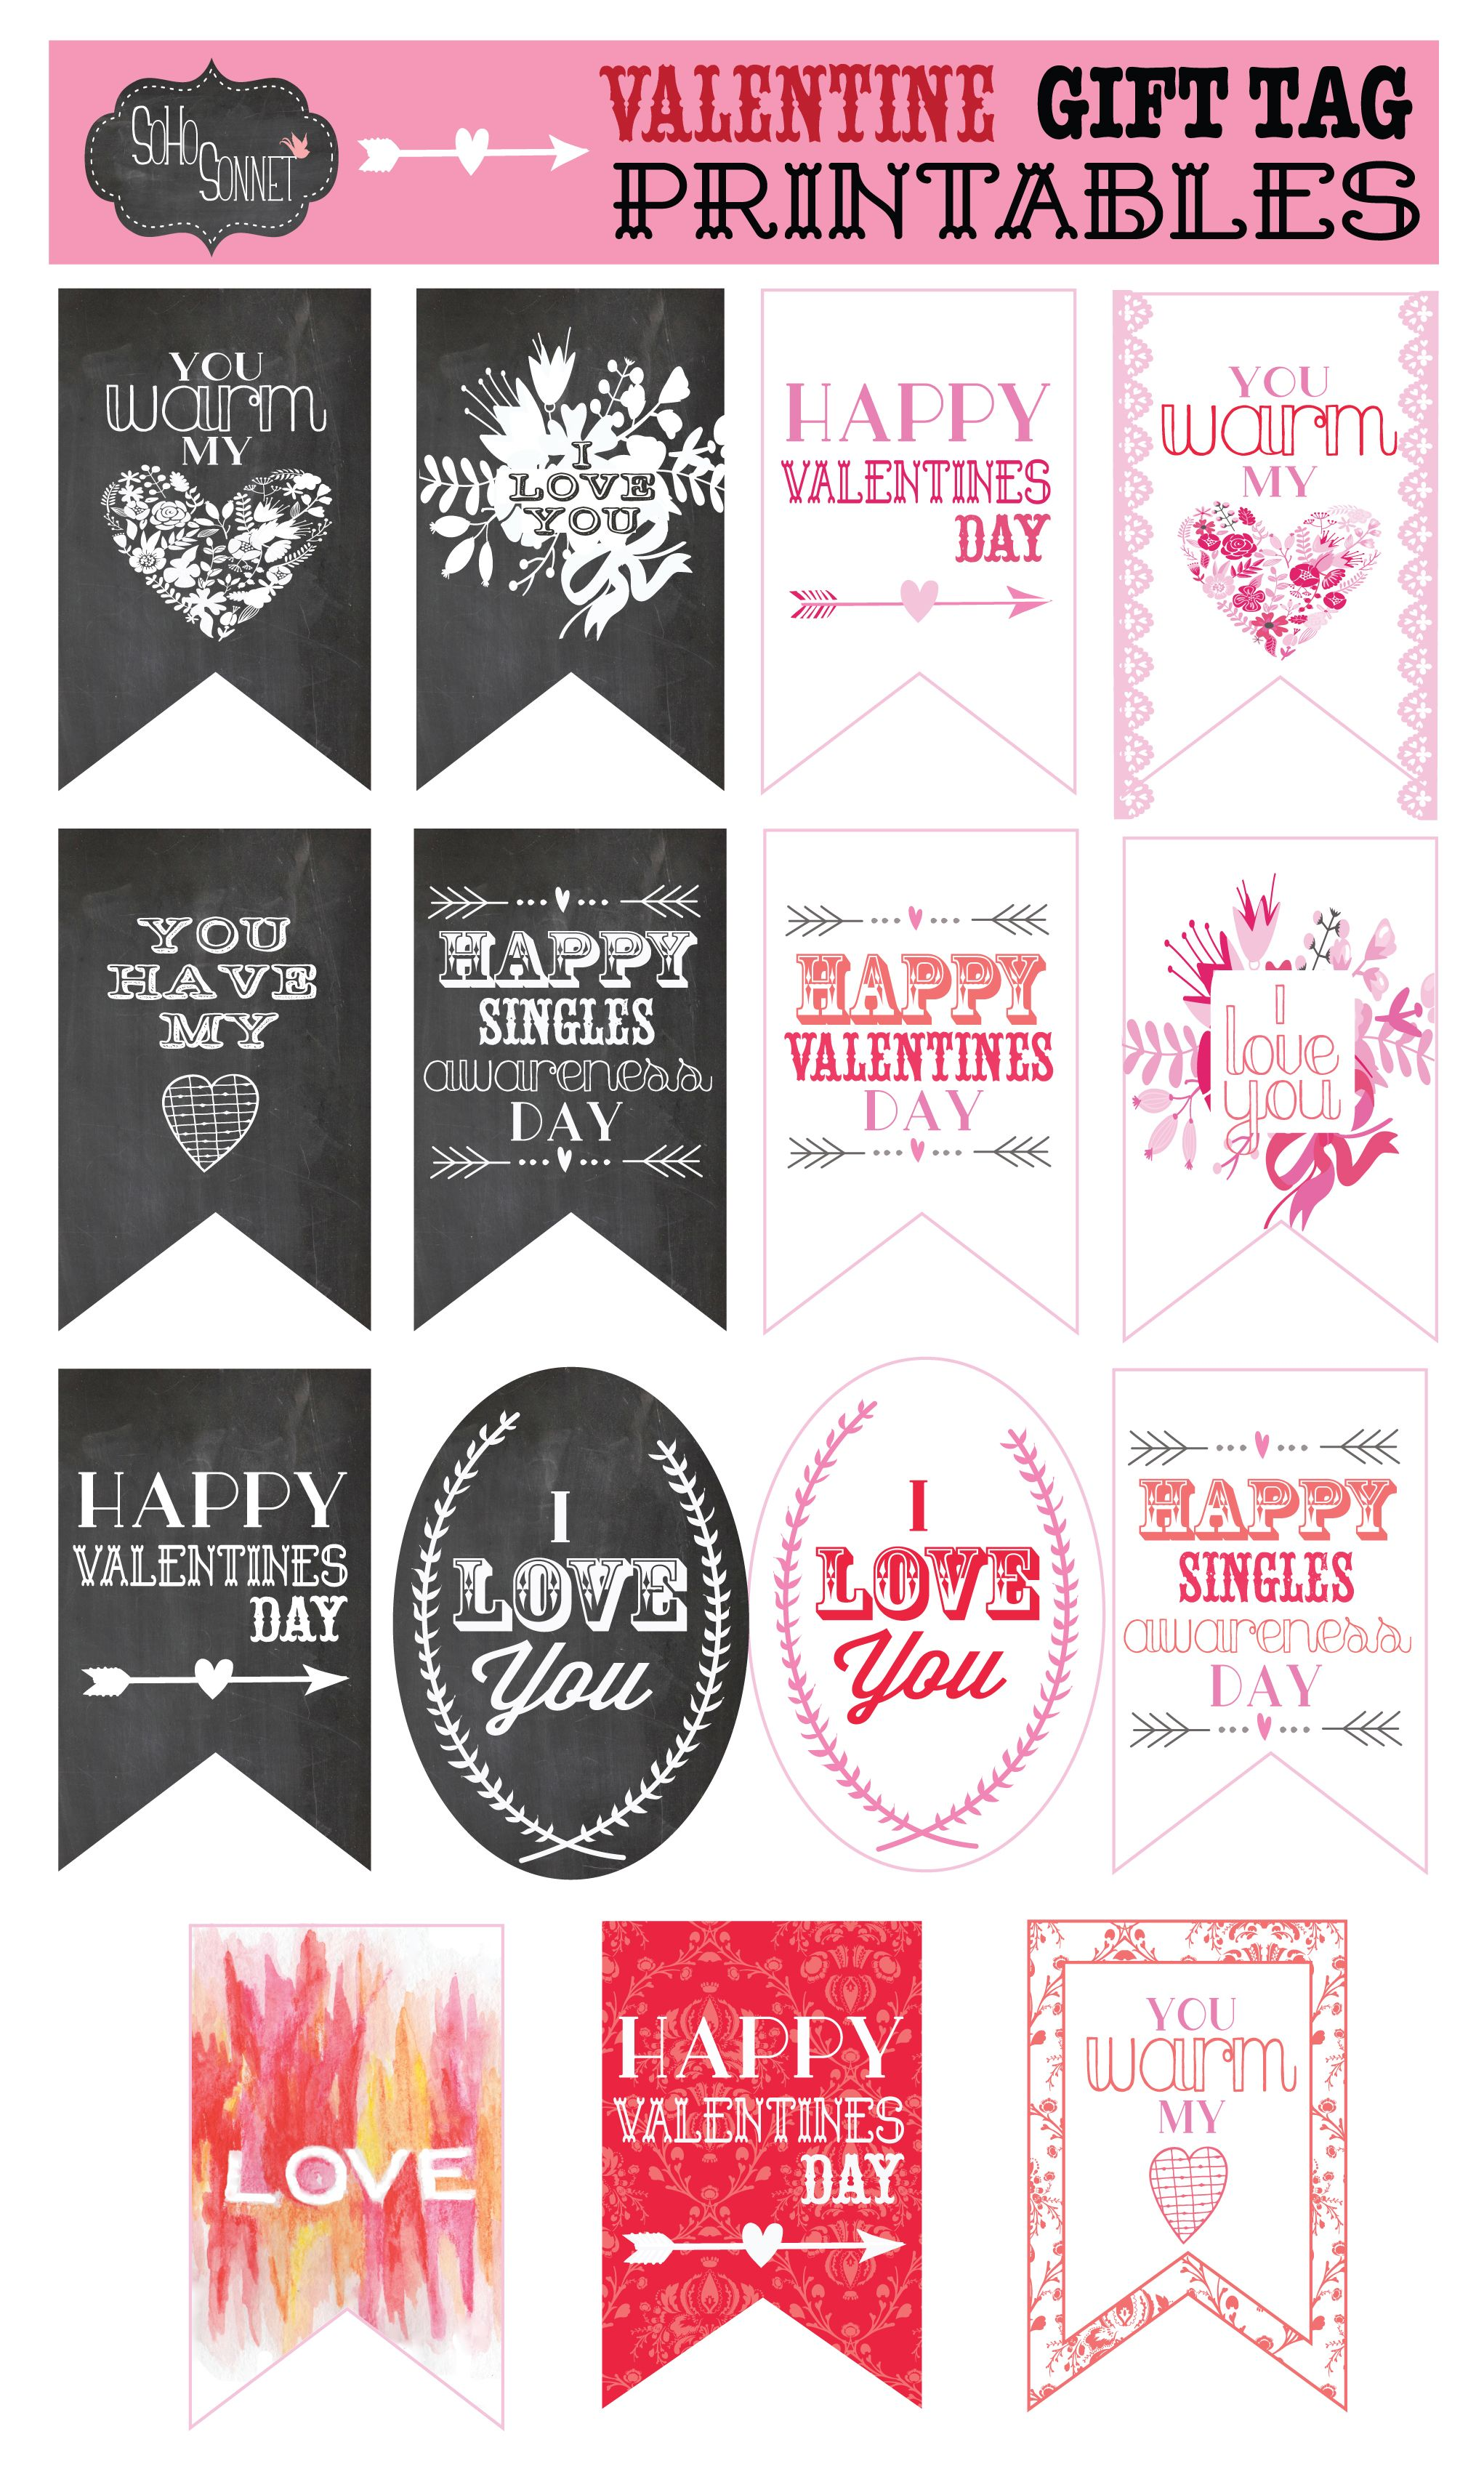 Free Valentine Gift Tag Printables – Free Printable Valentine Cards for Husband